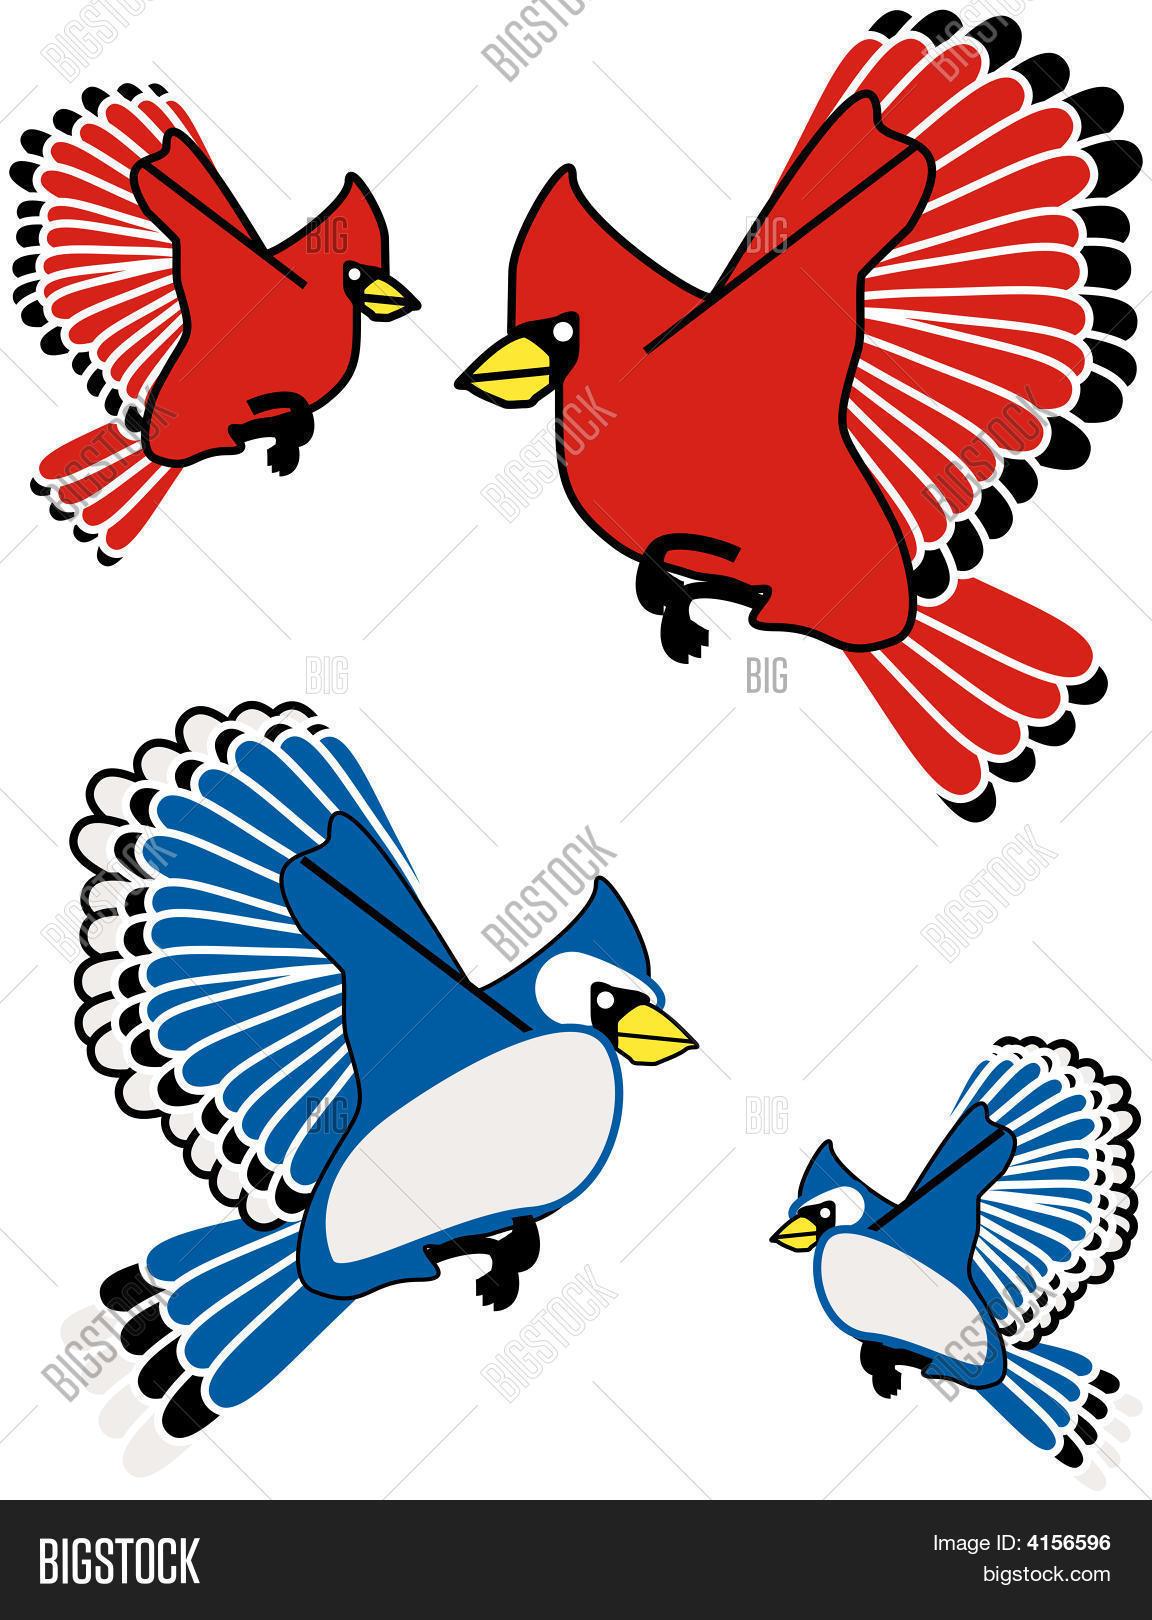 Blue Jay Cardinal Vector Photo Free Trial Bigstock